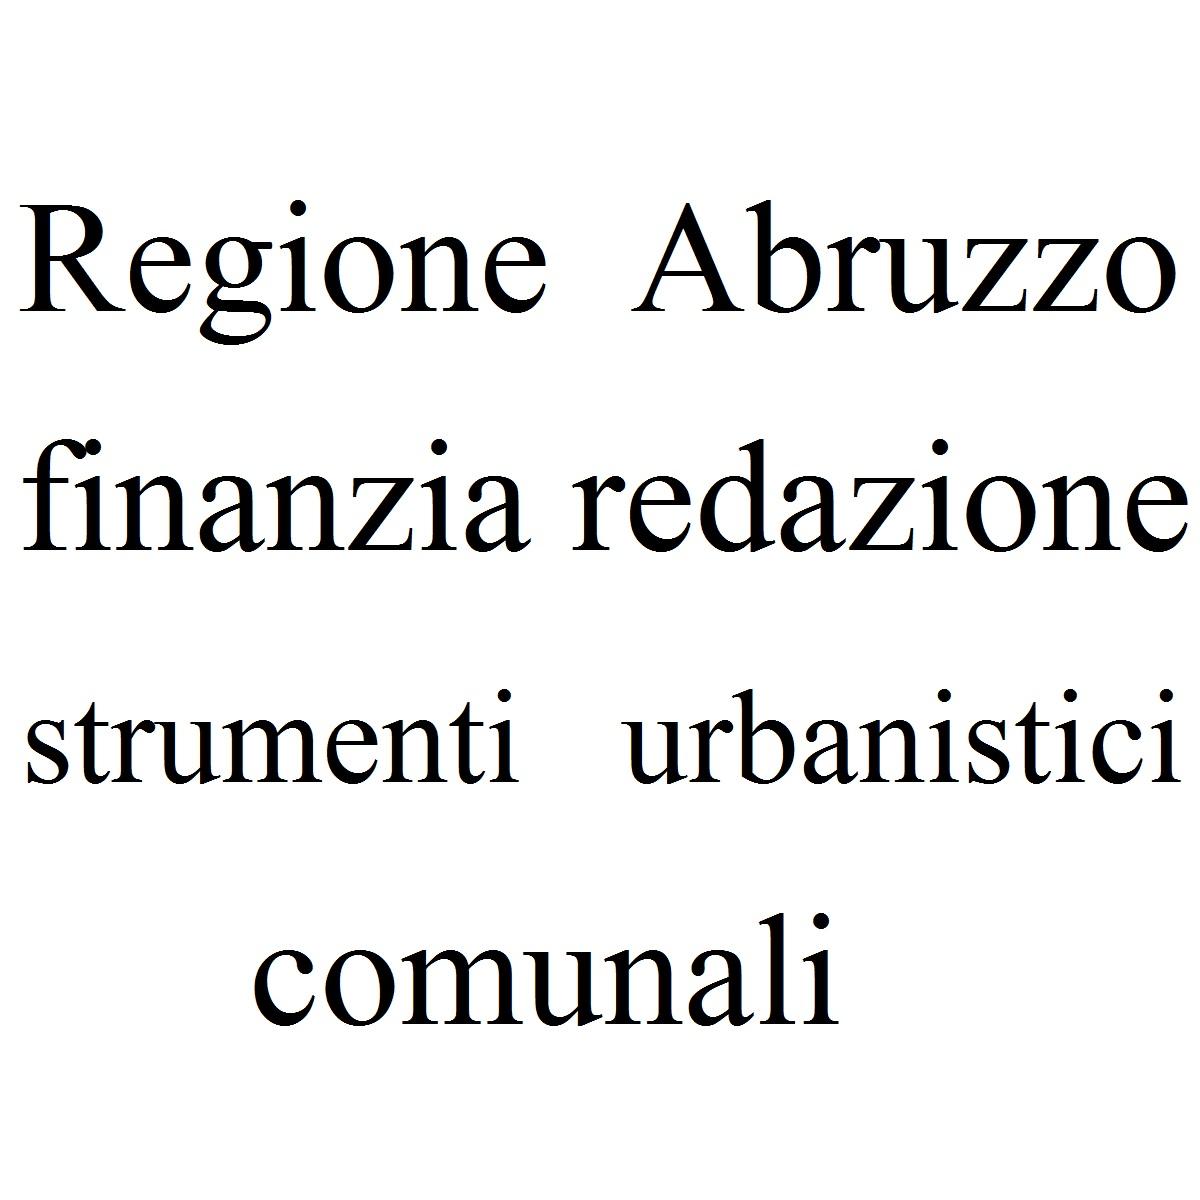 Regione finanzia redazione strumenti urbanistici comunali foto